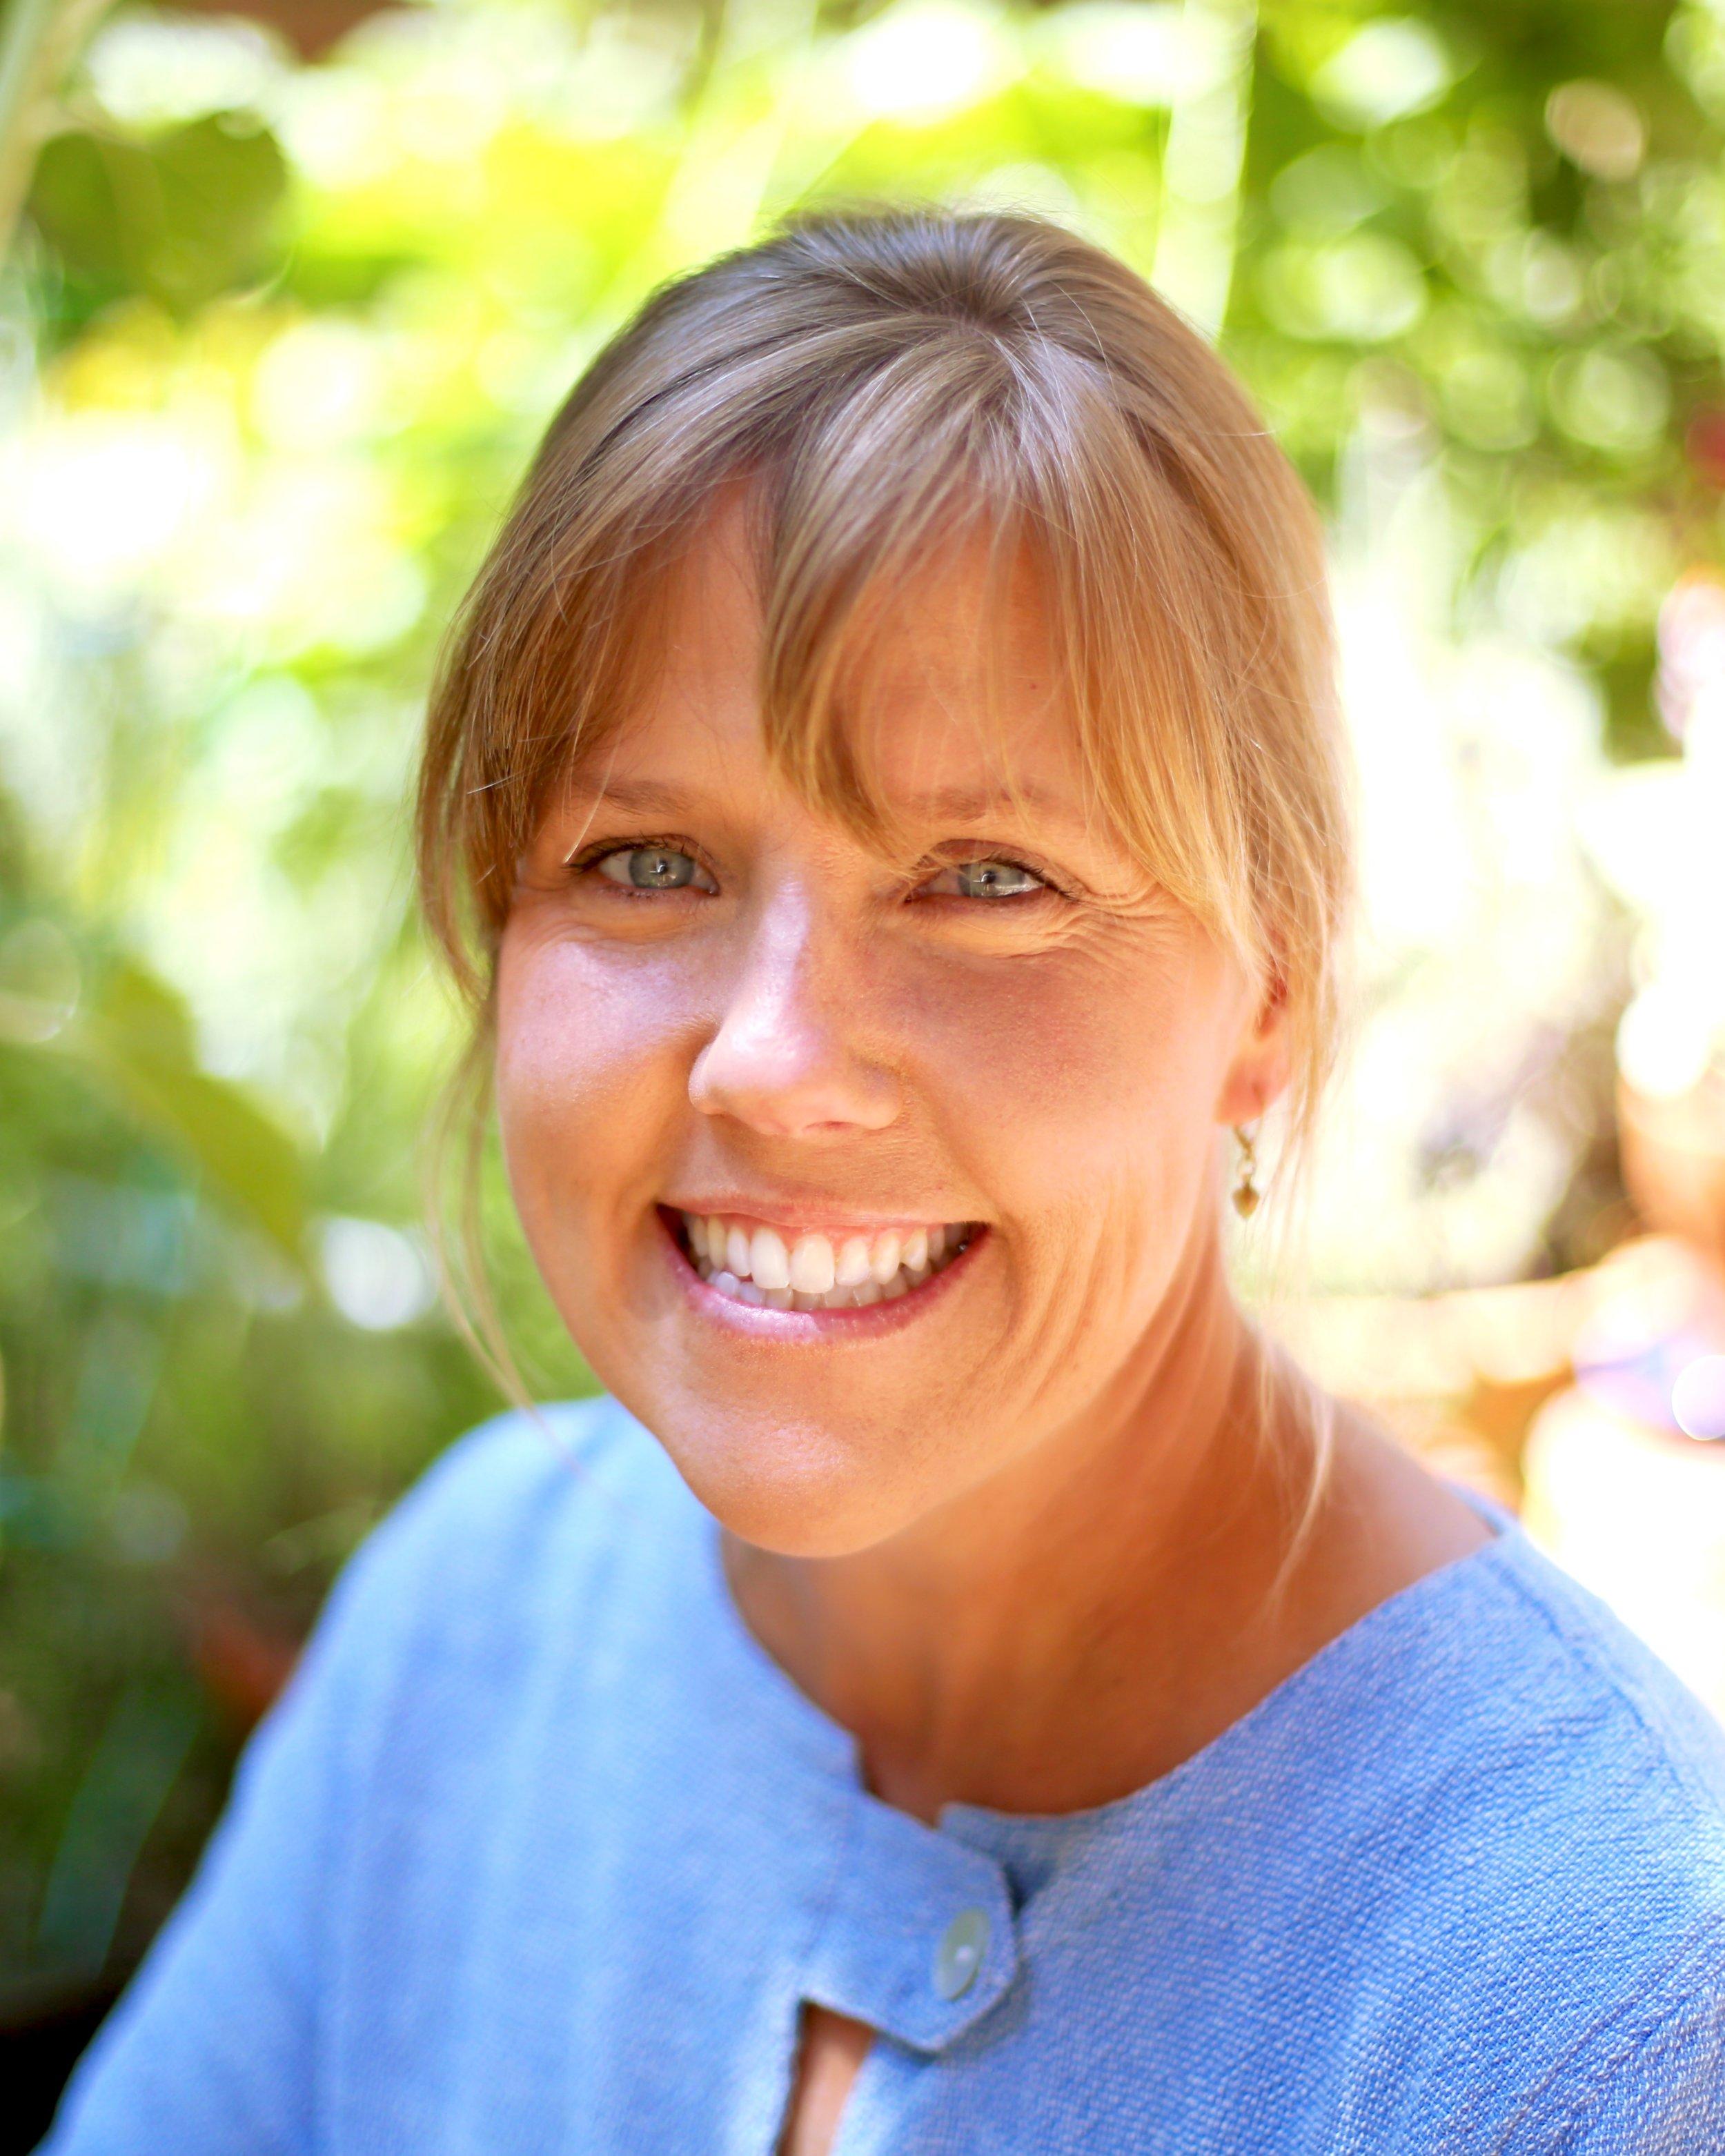 Sarah Whitmore Preschool Teacher